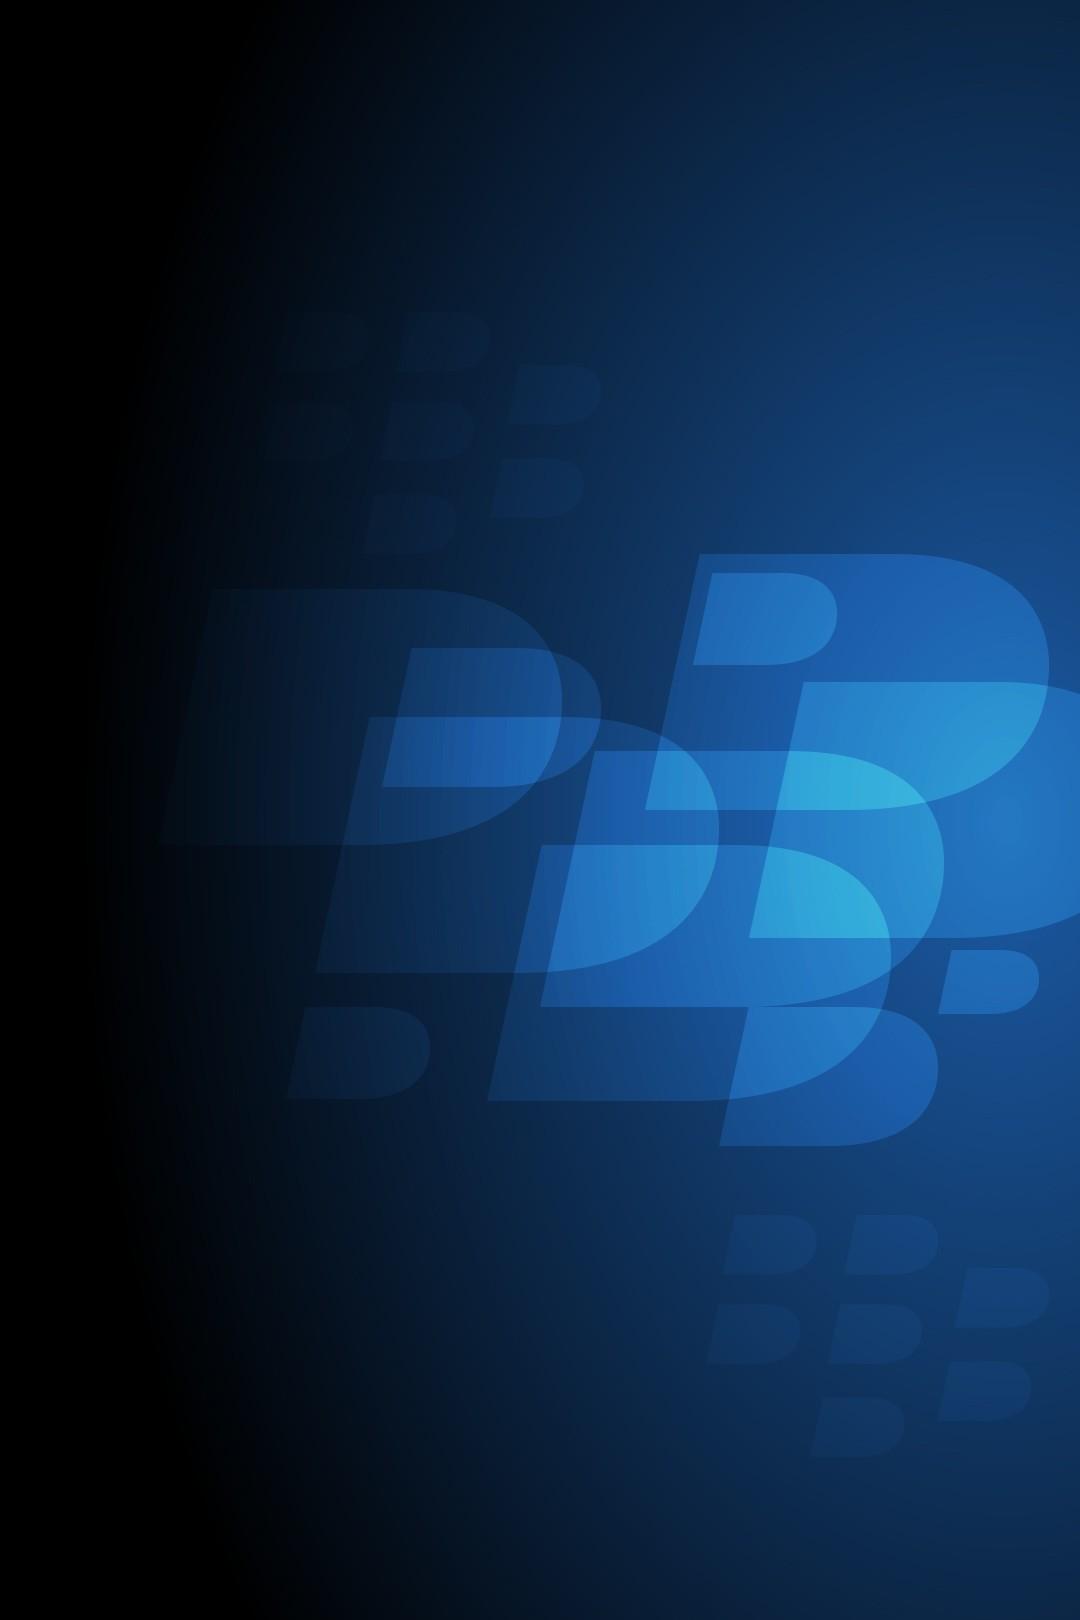 BlackberryKeyoneStockWallpapersHd